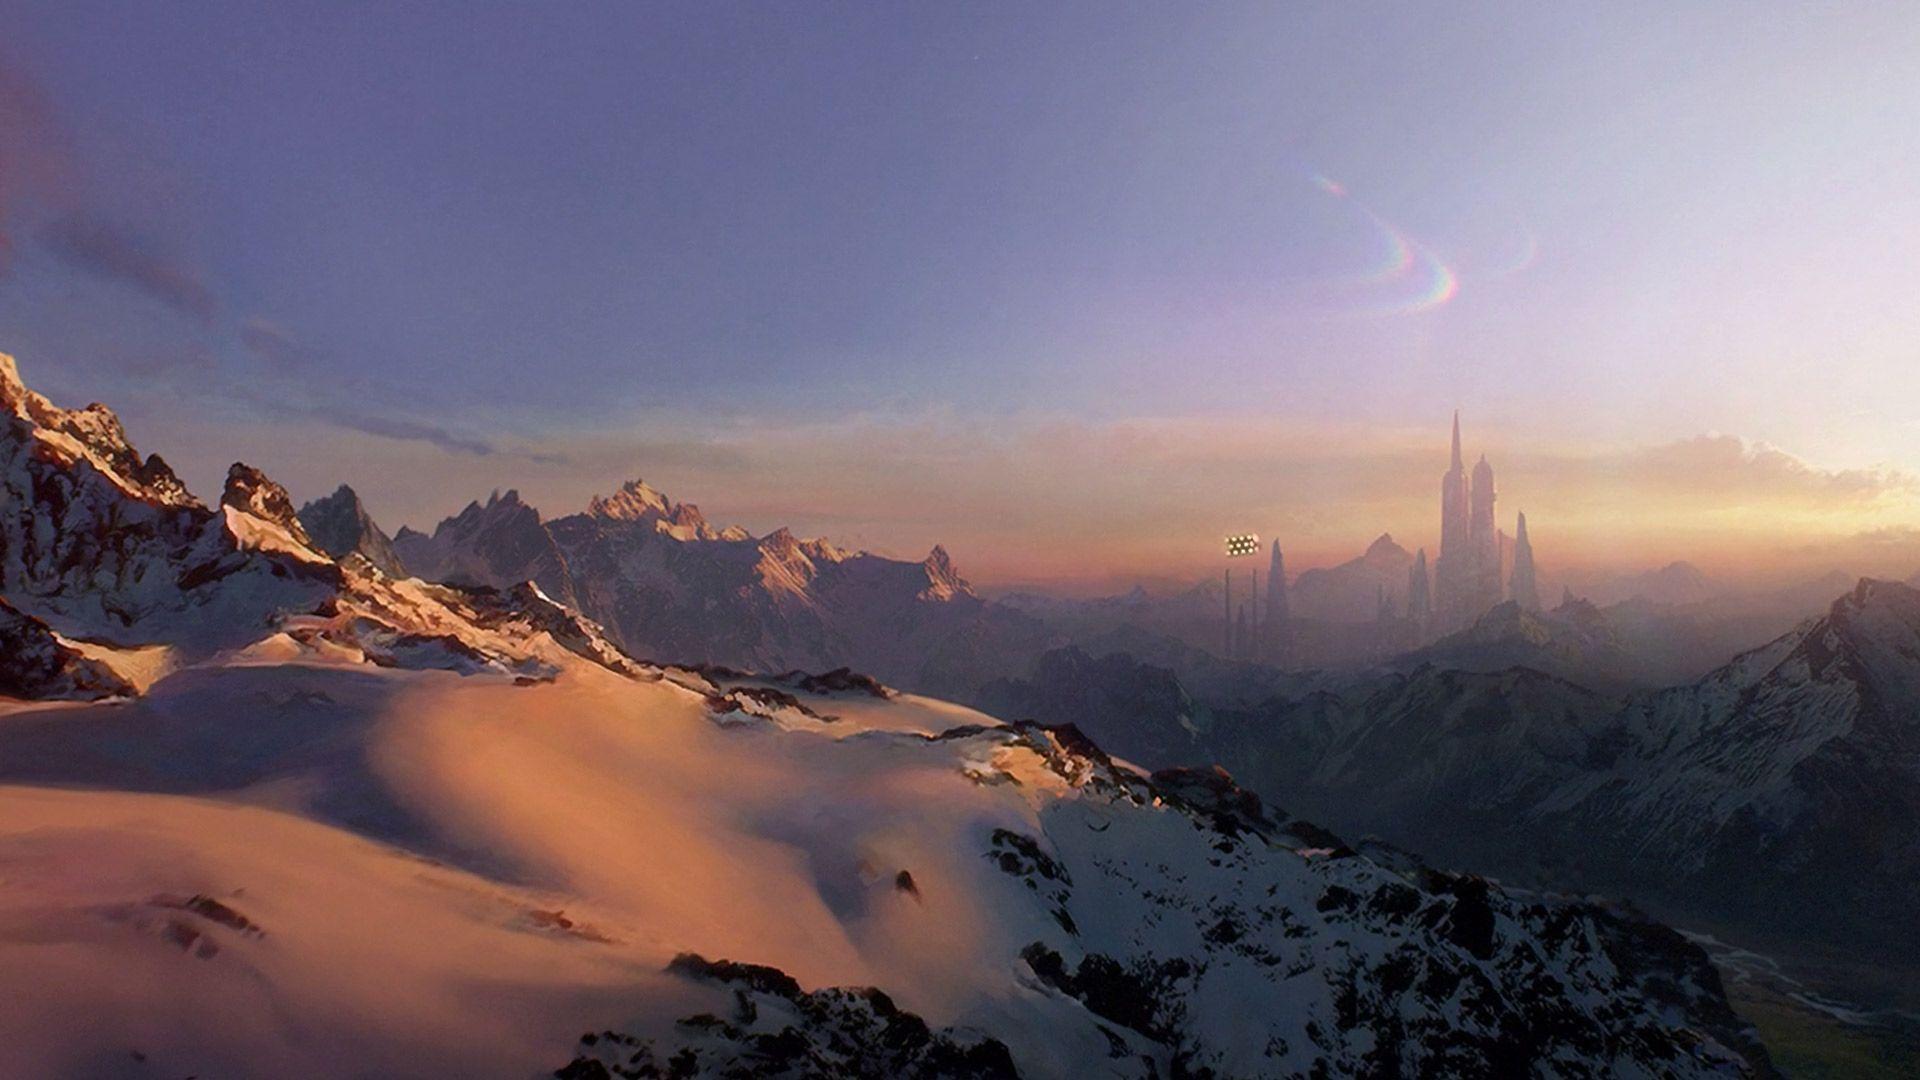 Alderaan Star Wars Planets Star Wars Star Wars Rpg